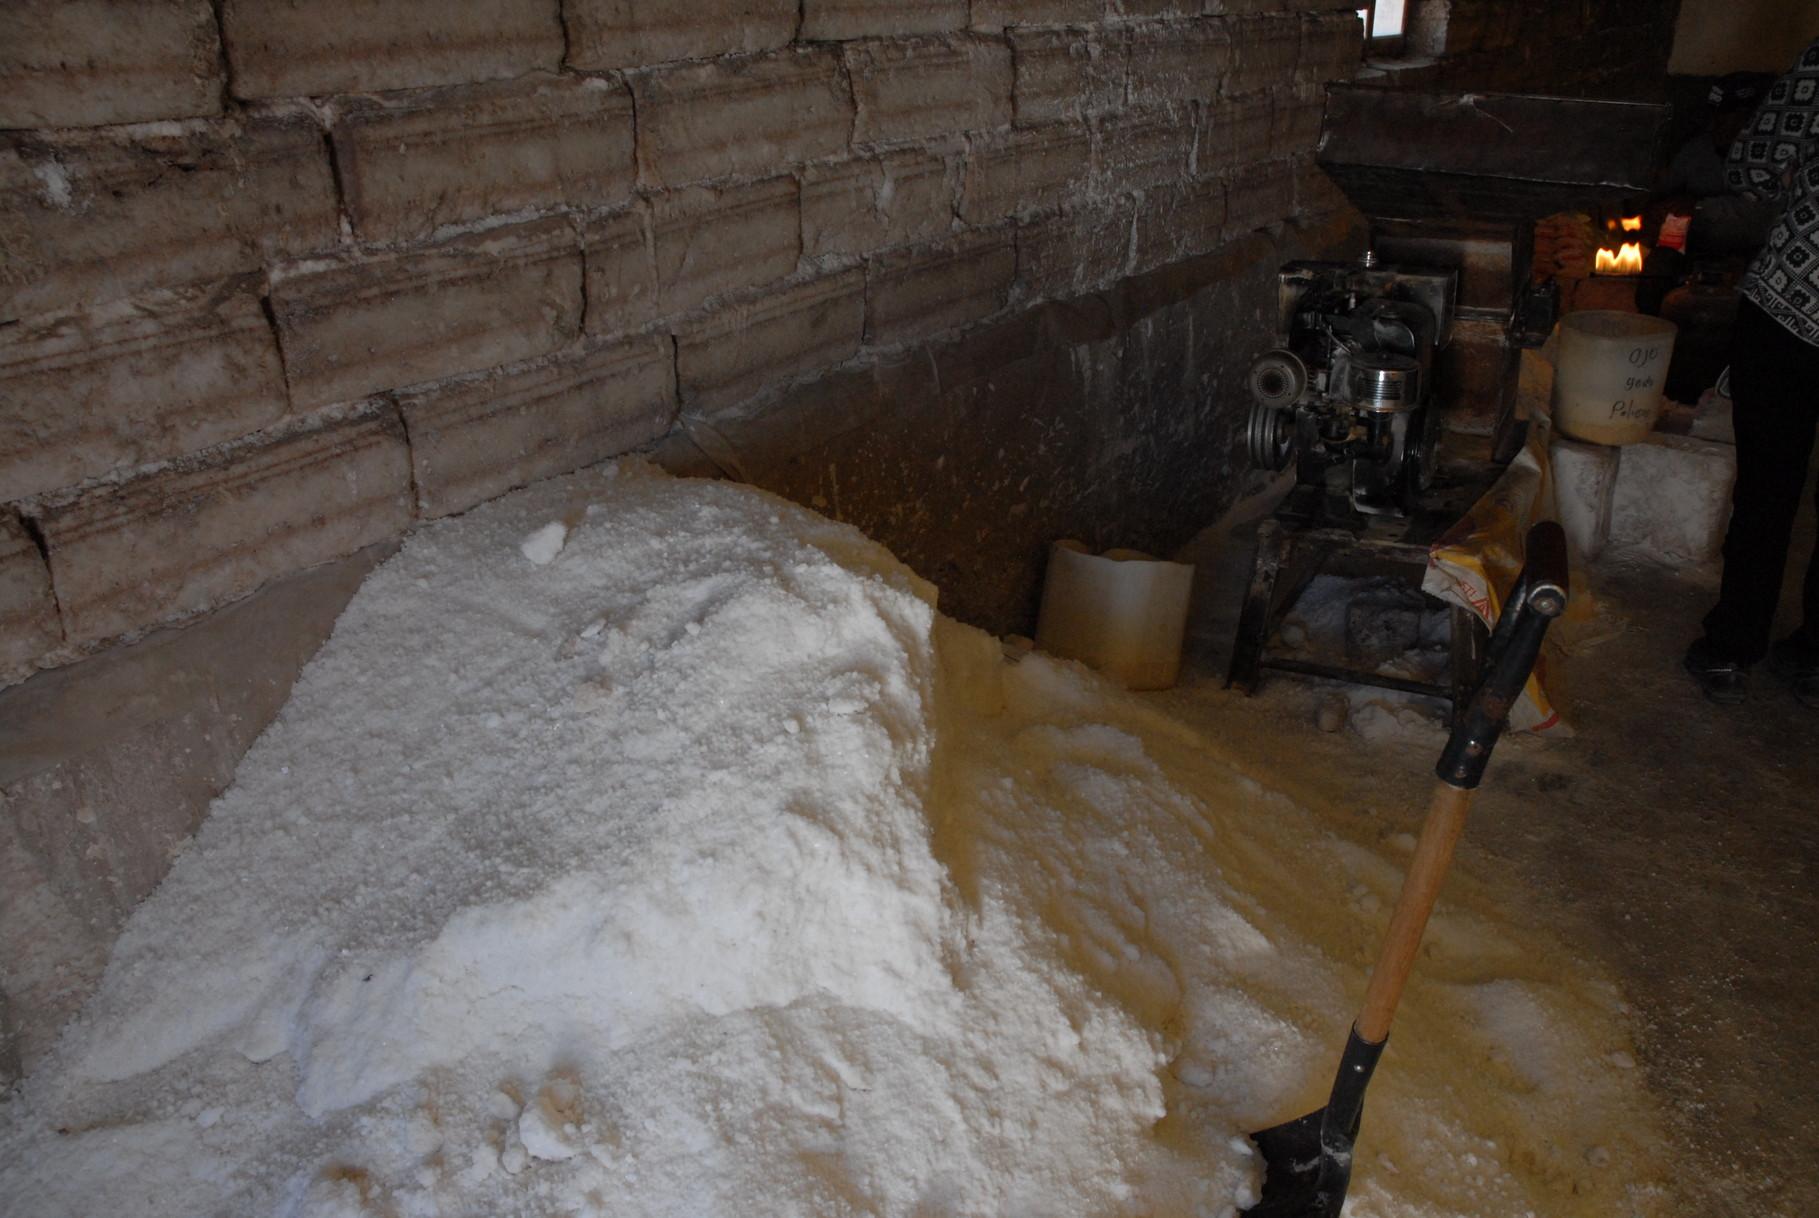 Getrocknetes Salz fertig zum Abpacken